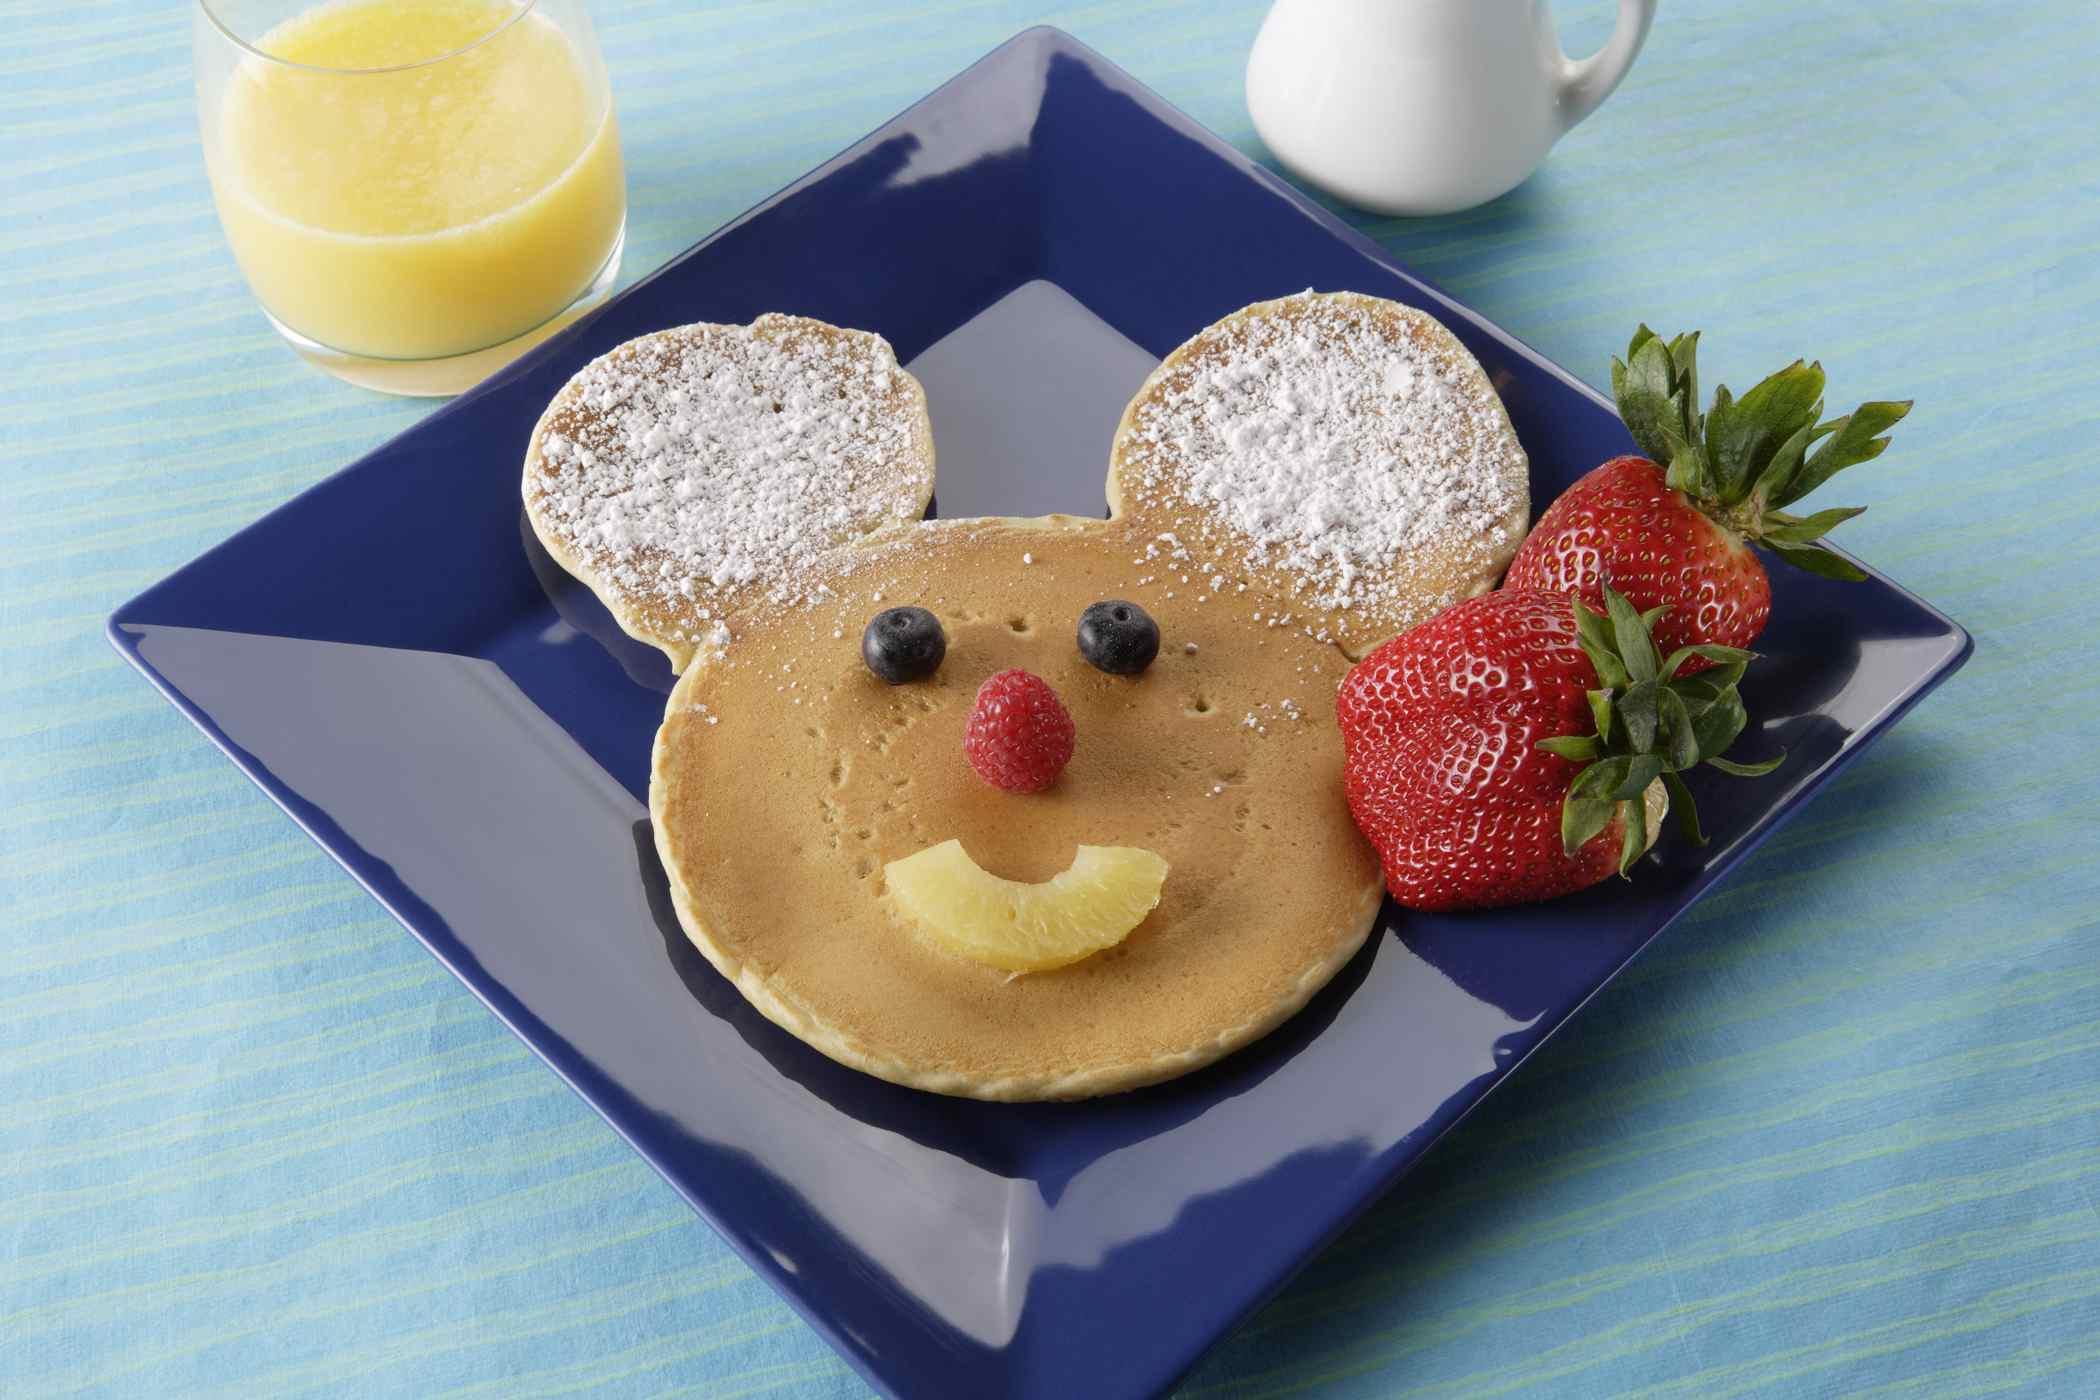 Mickey Mouse Pancakes at Disneyland